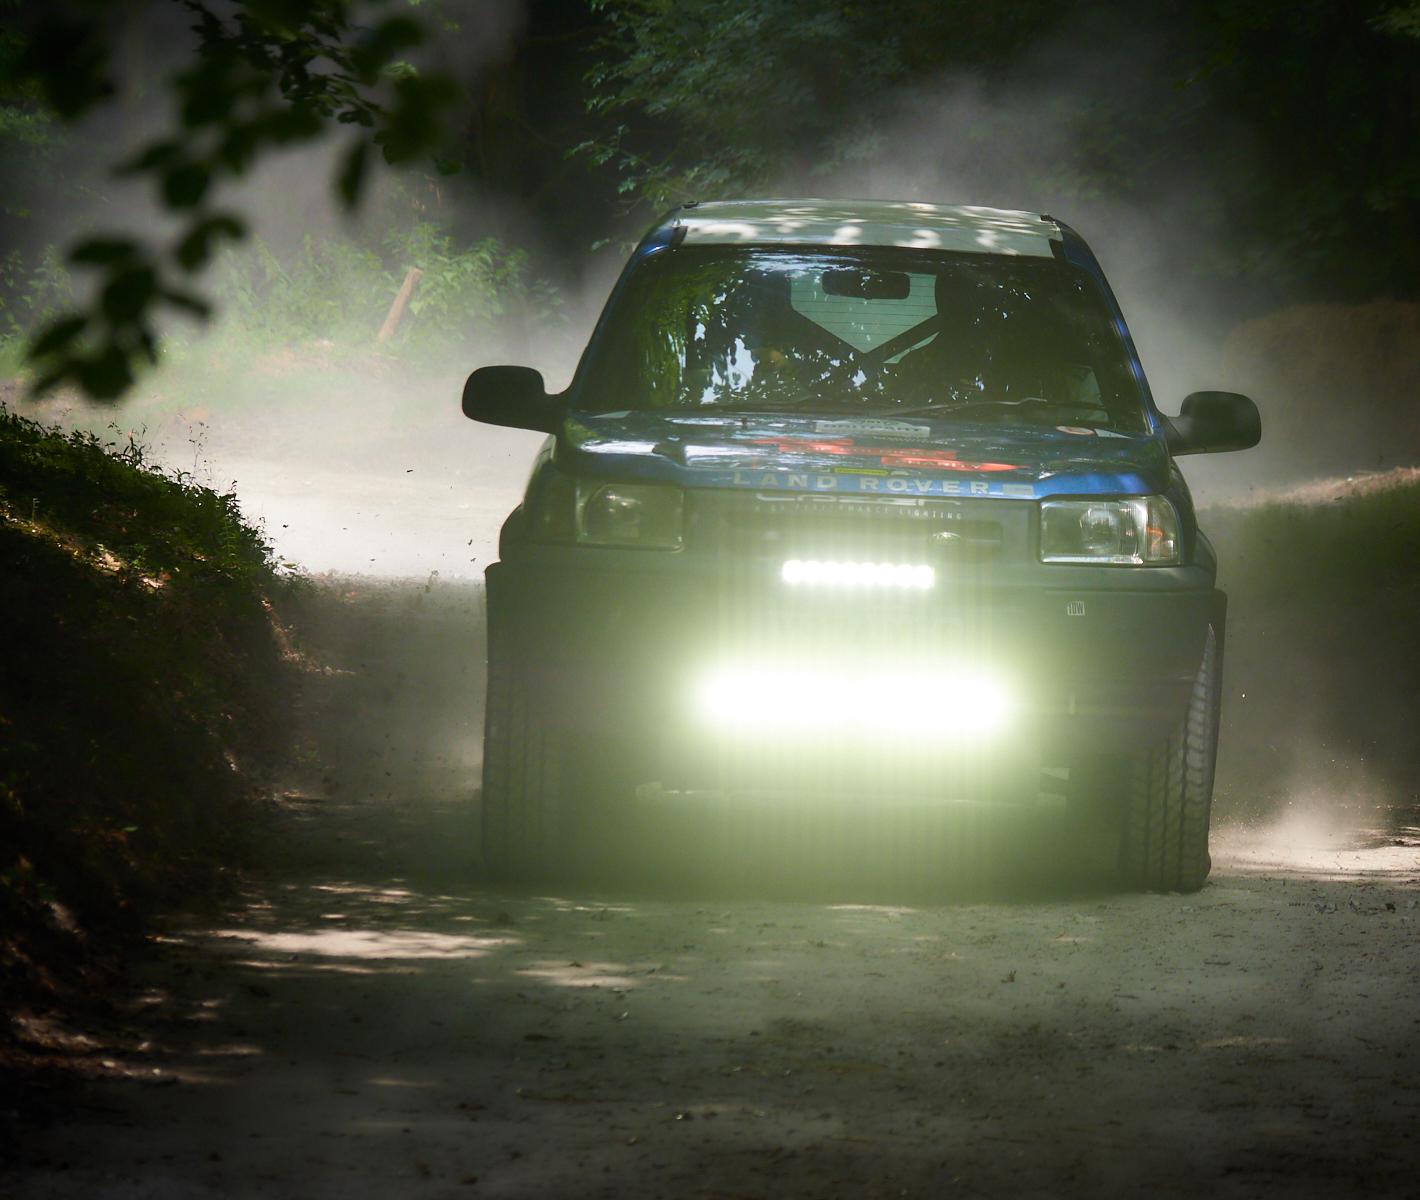 Incoming Land Rover1600x1200 sRGB.jpg